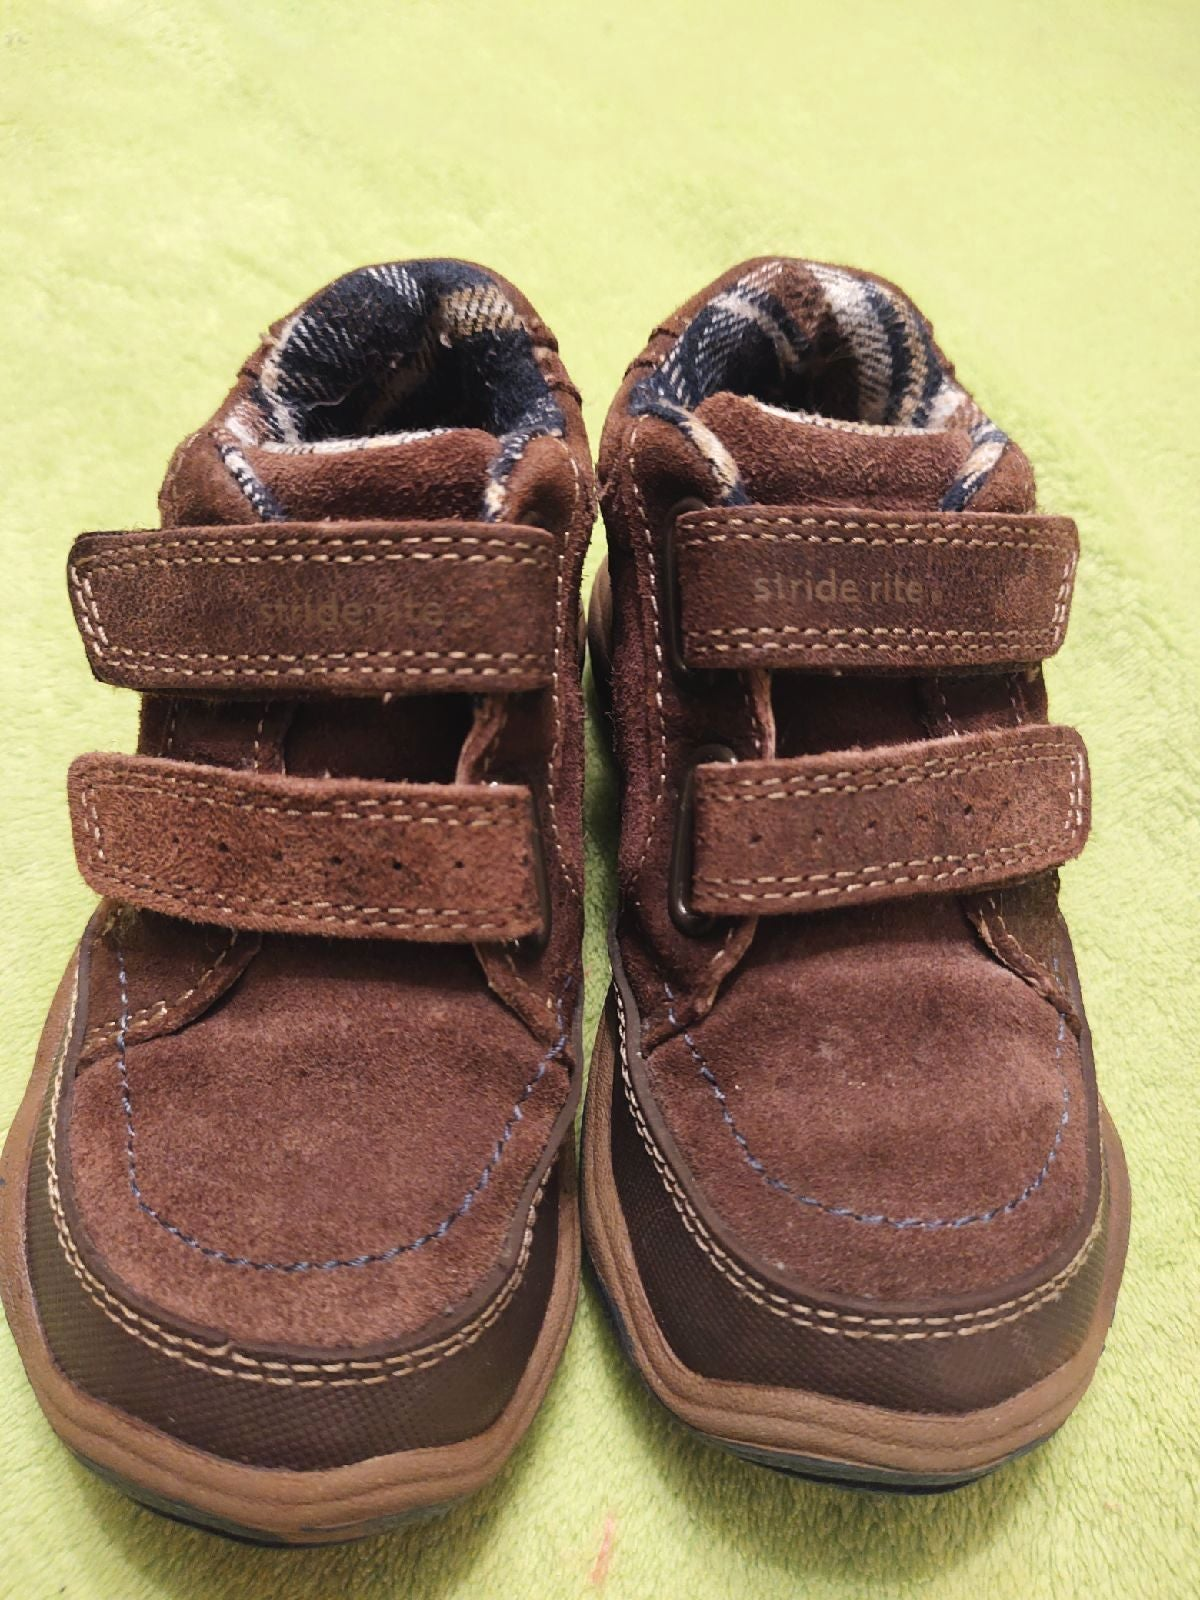 Stride rite shoes toddler boy size 8.5